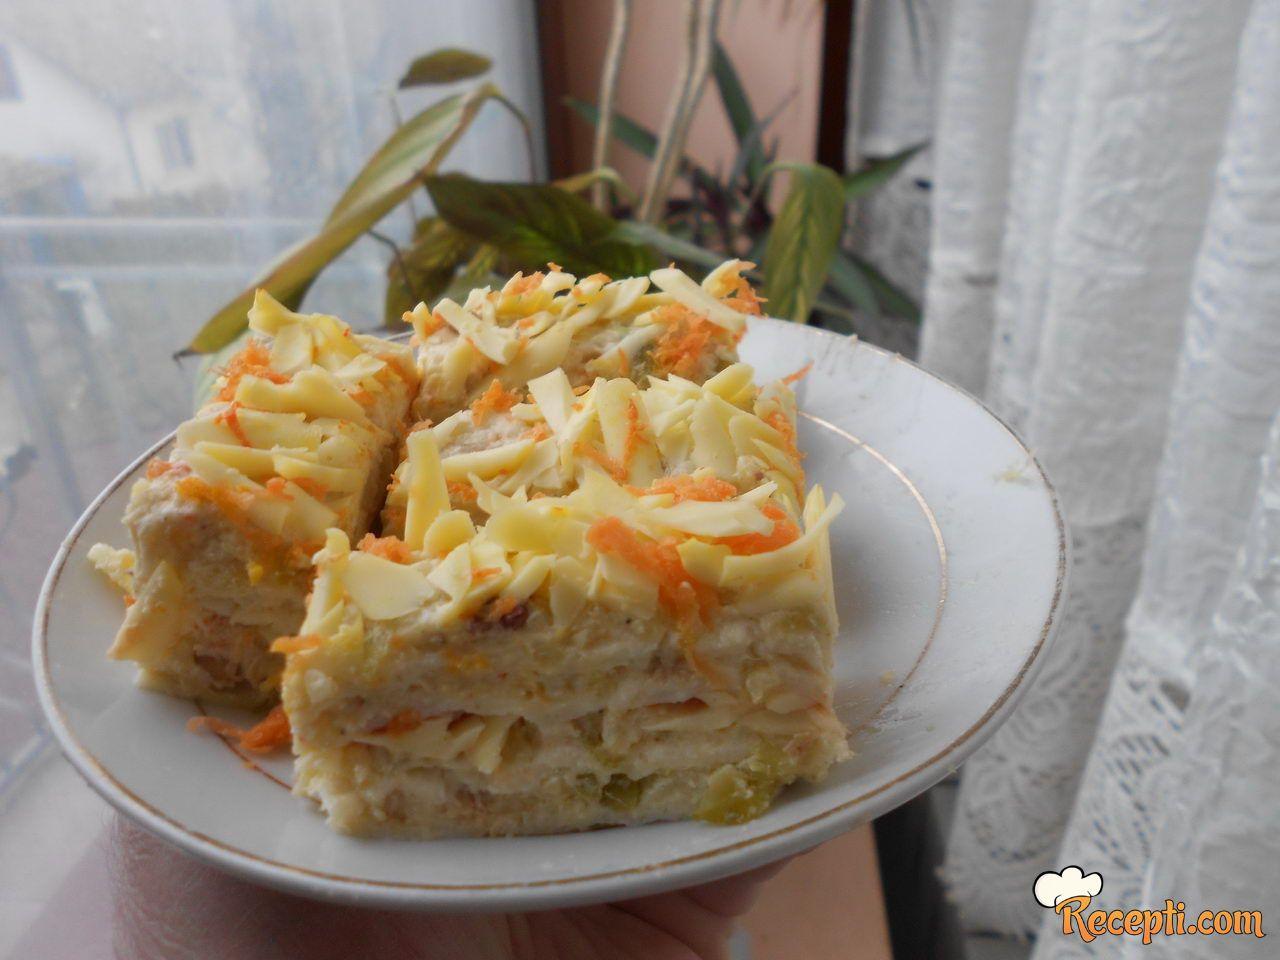 Posna Torta Domaci Recepti / Posna Torta Domaci Recepti / Brza Posna Torta Youtube ... / Posna ...